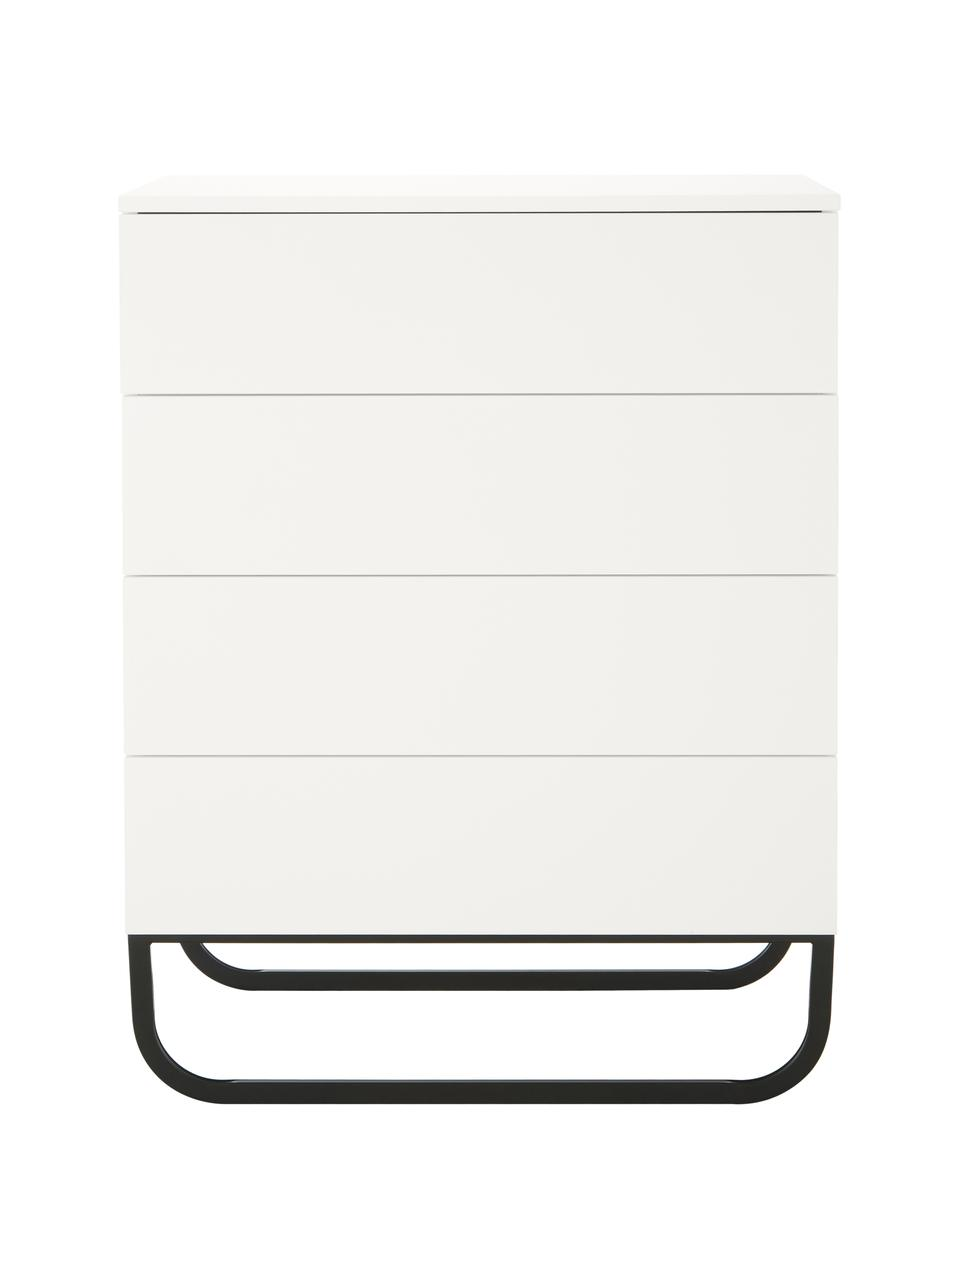 Cassettiera bianca Sanford, Bianco, nero, Larg. 80 x Alt. 106 cm